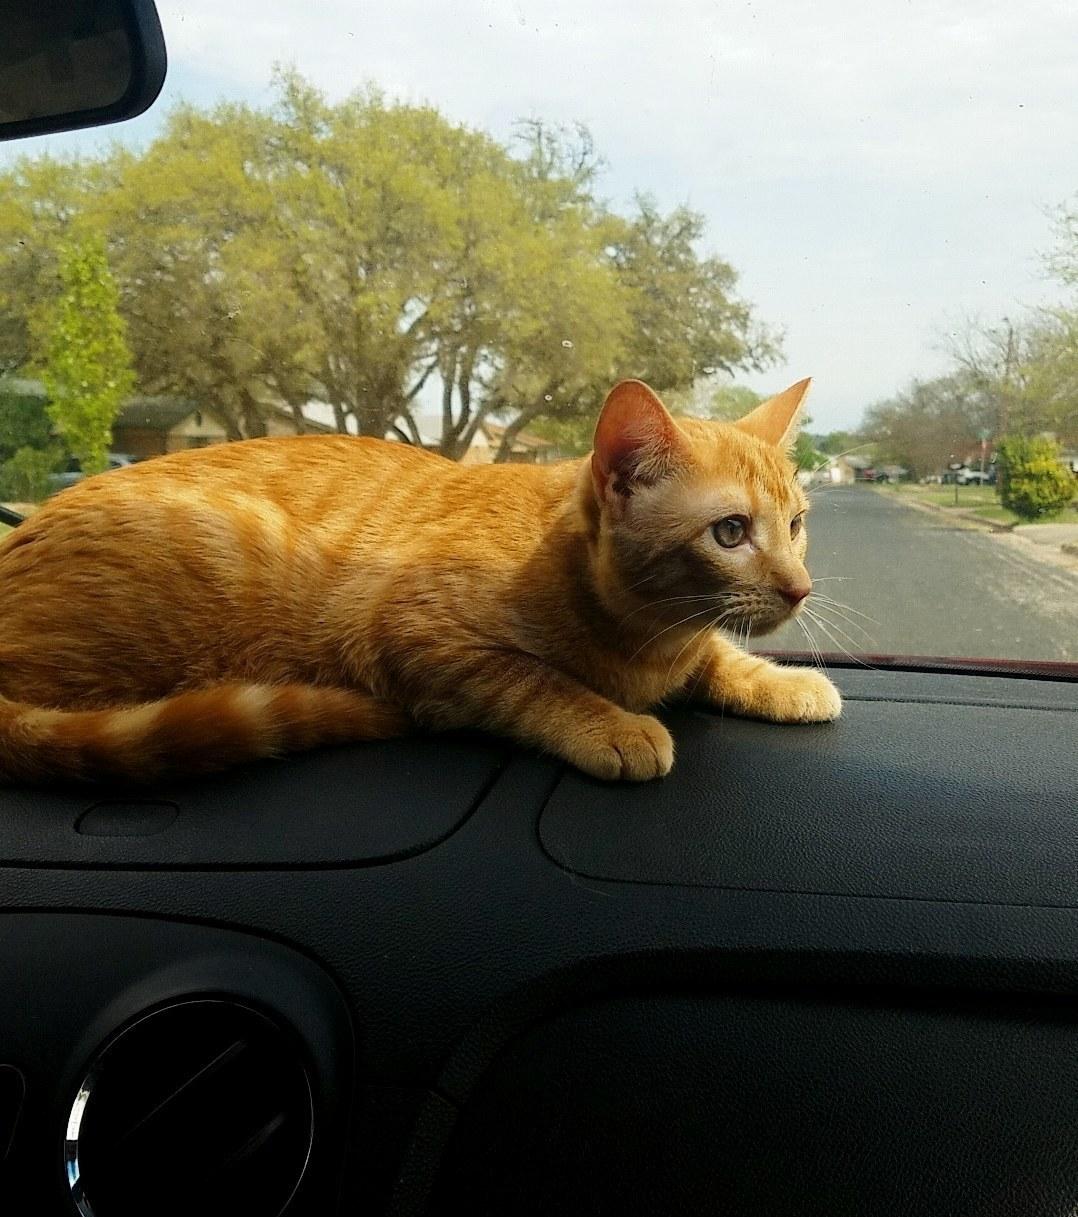 Dewey enjoying his ride around the block